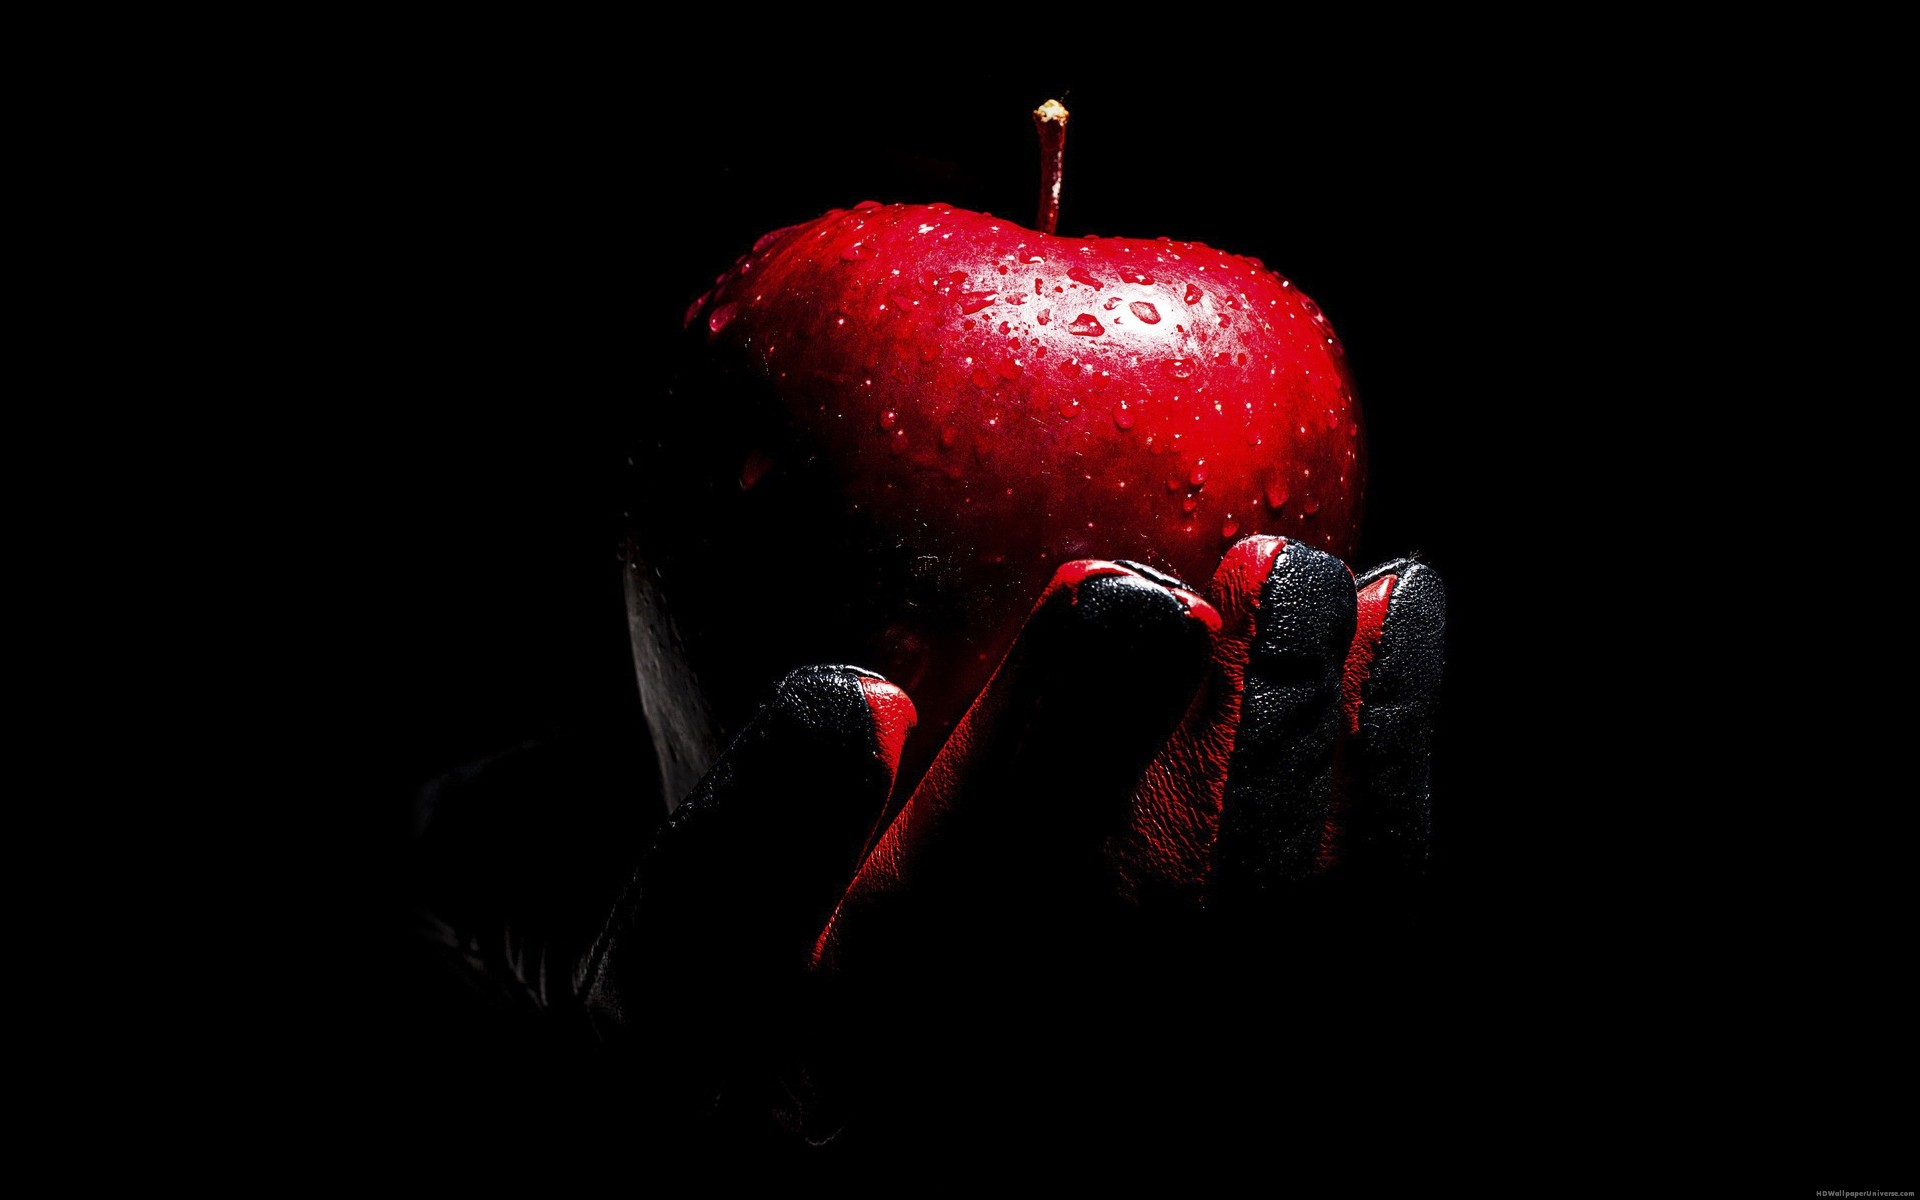 Red Apple black leather glove HD Wallpaper – https://www.hdwallpaperuniverse.